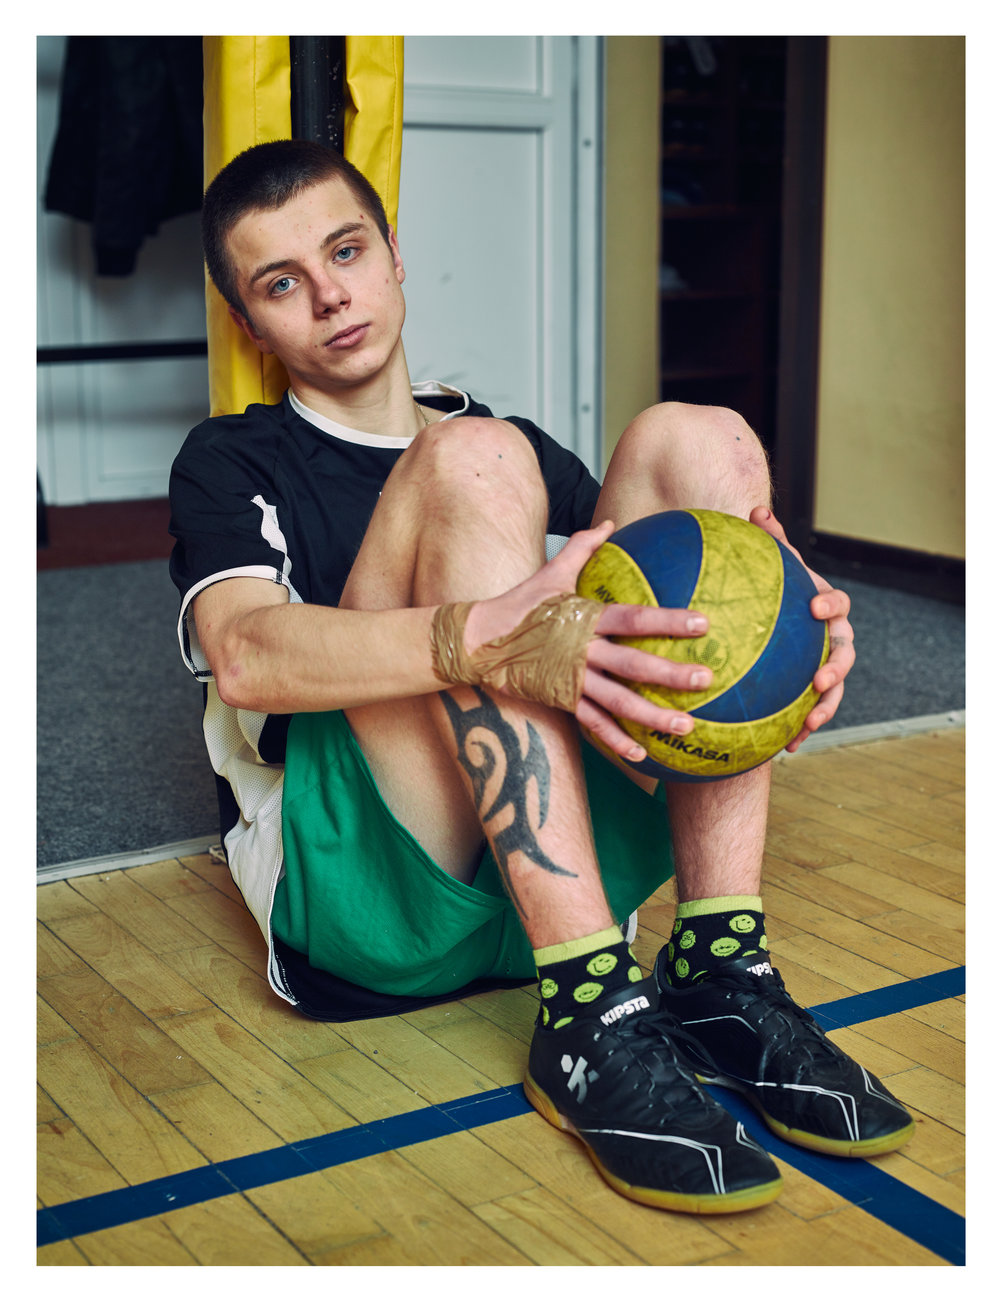 Mefka, Sports. © Zuza Karajewka